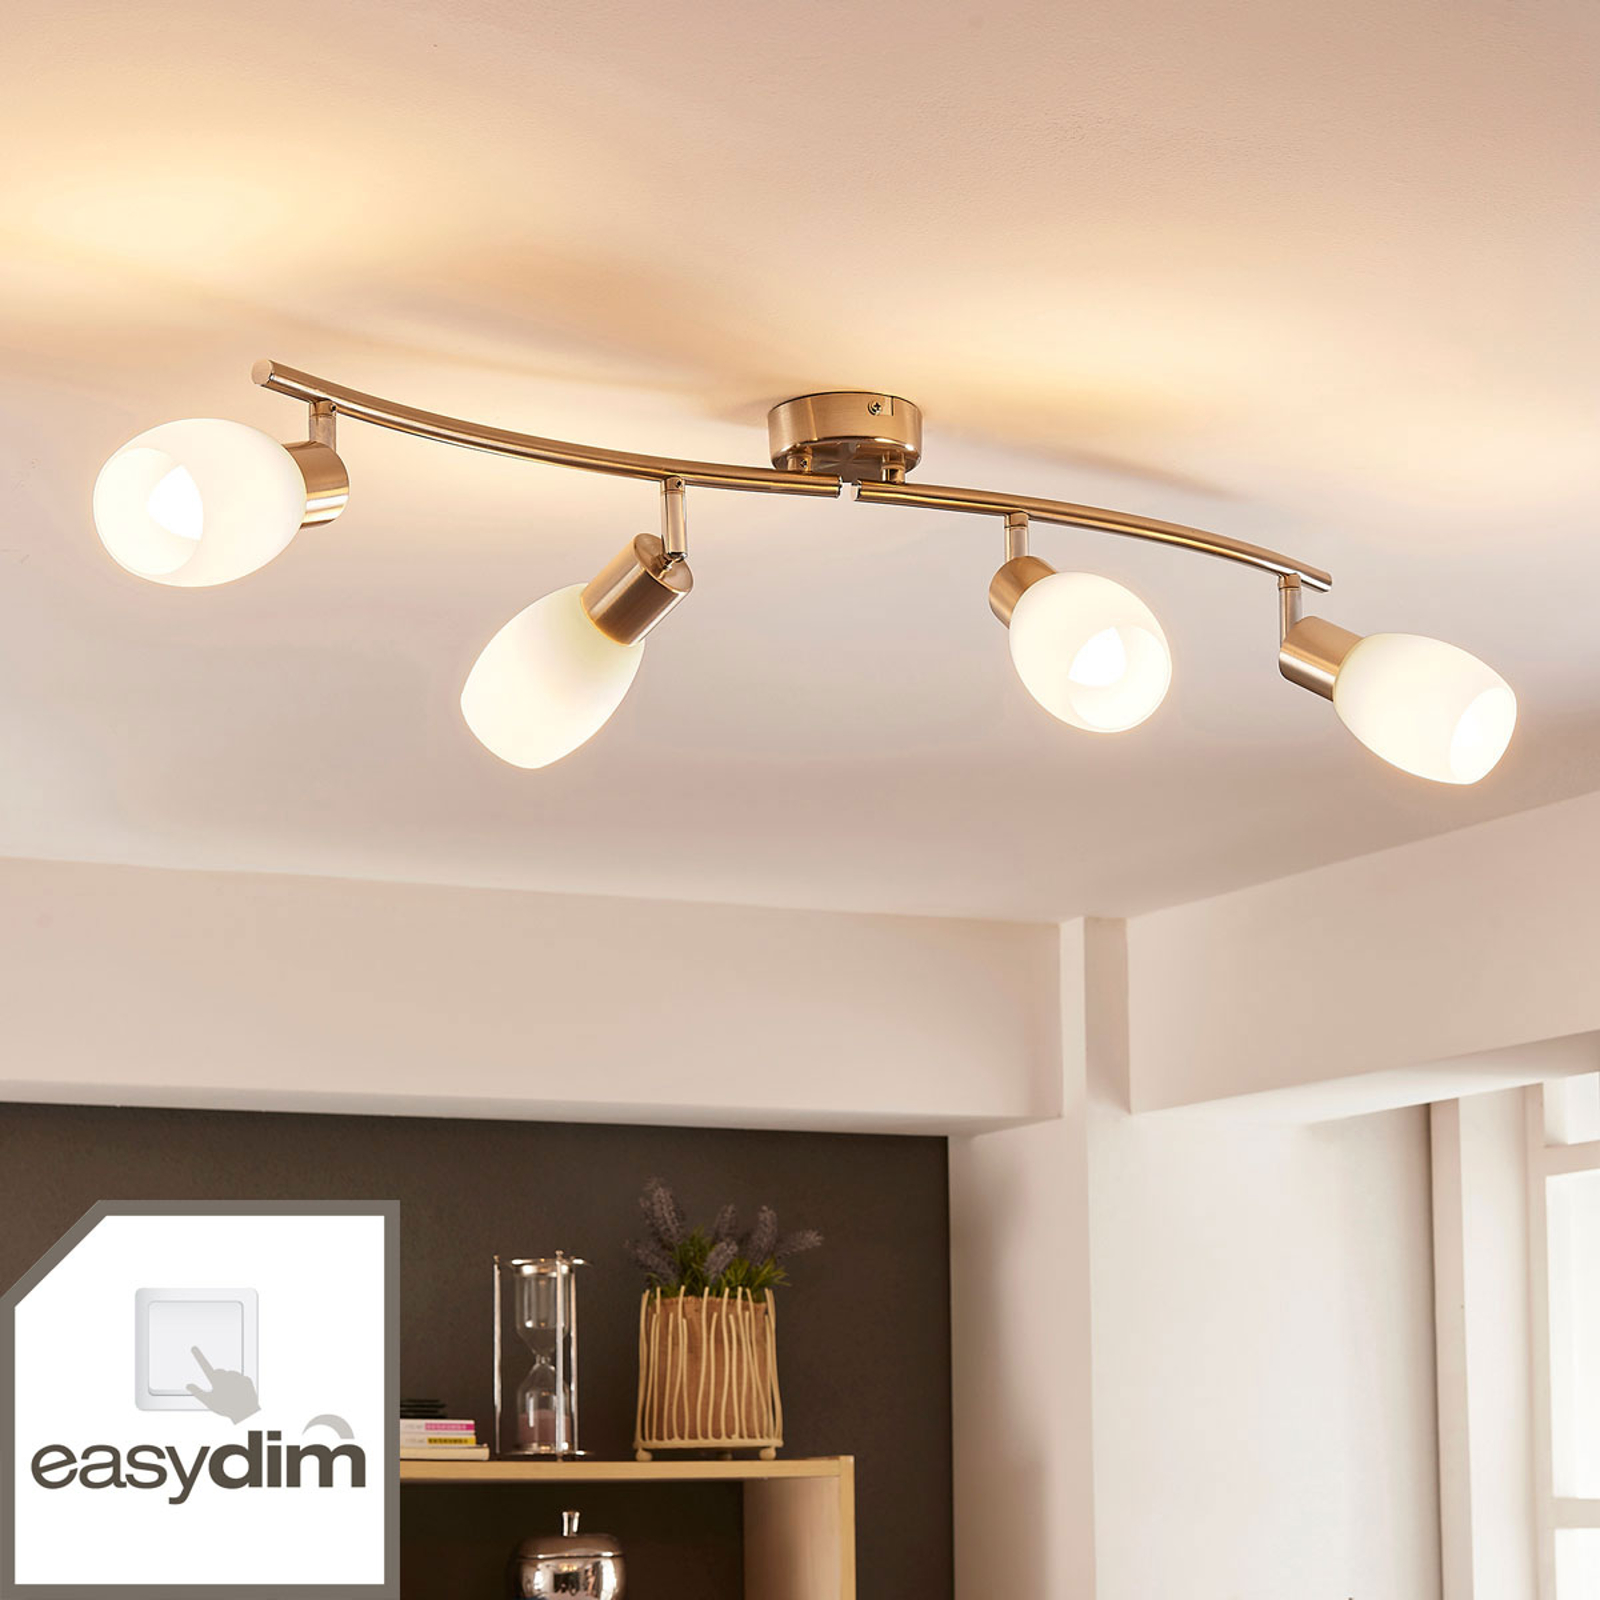 LEDplafondlamp Arda met vier lampjes, easydim